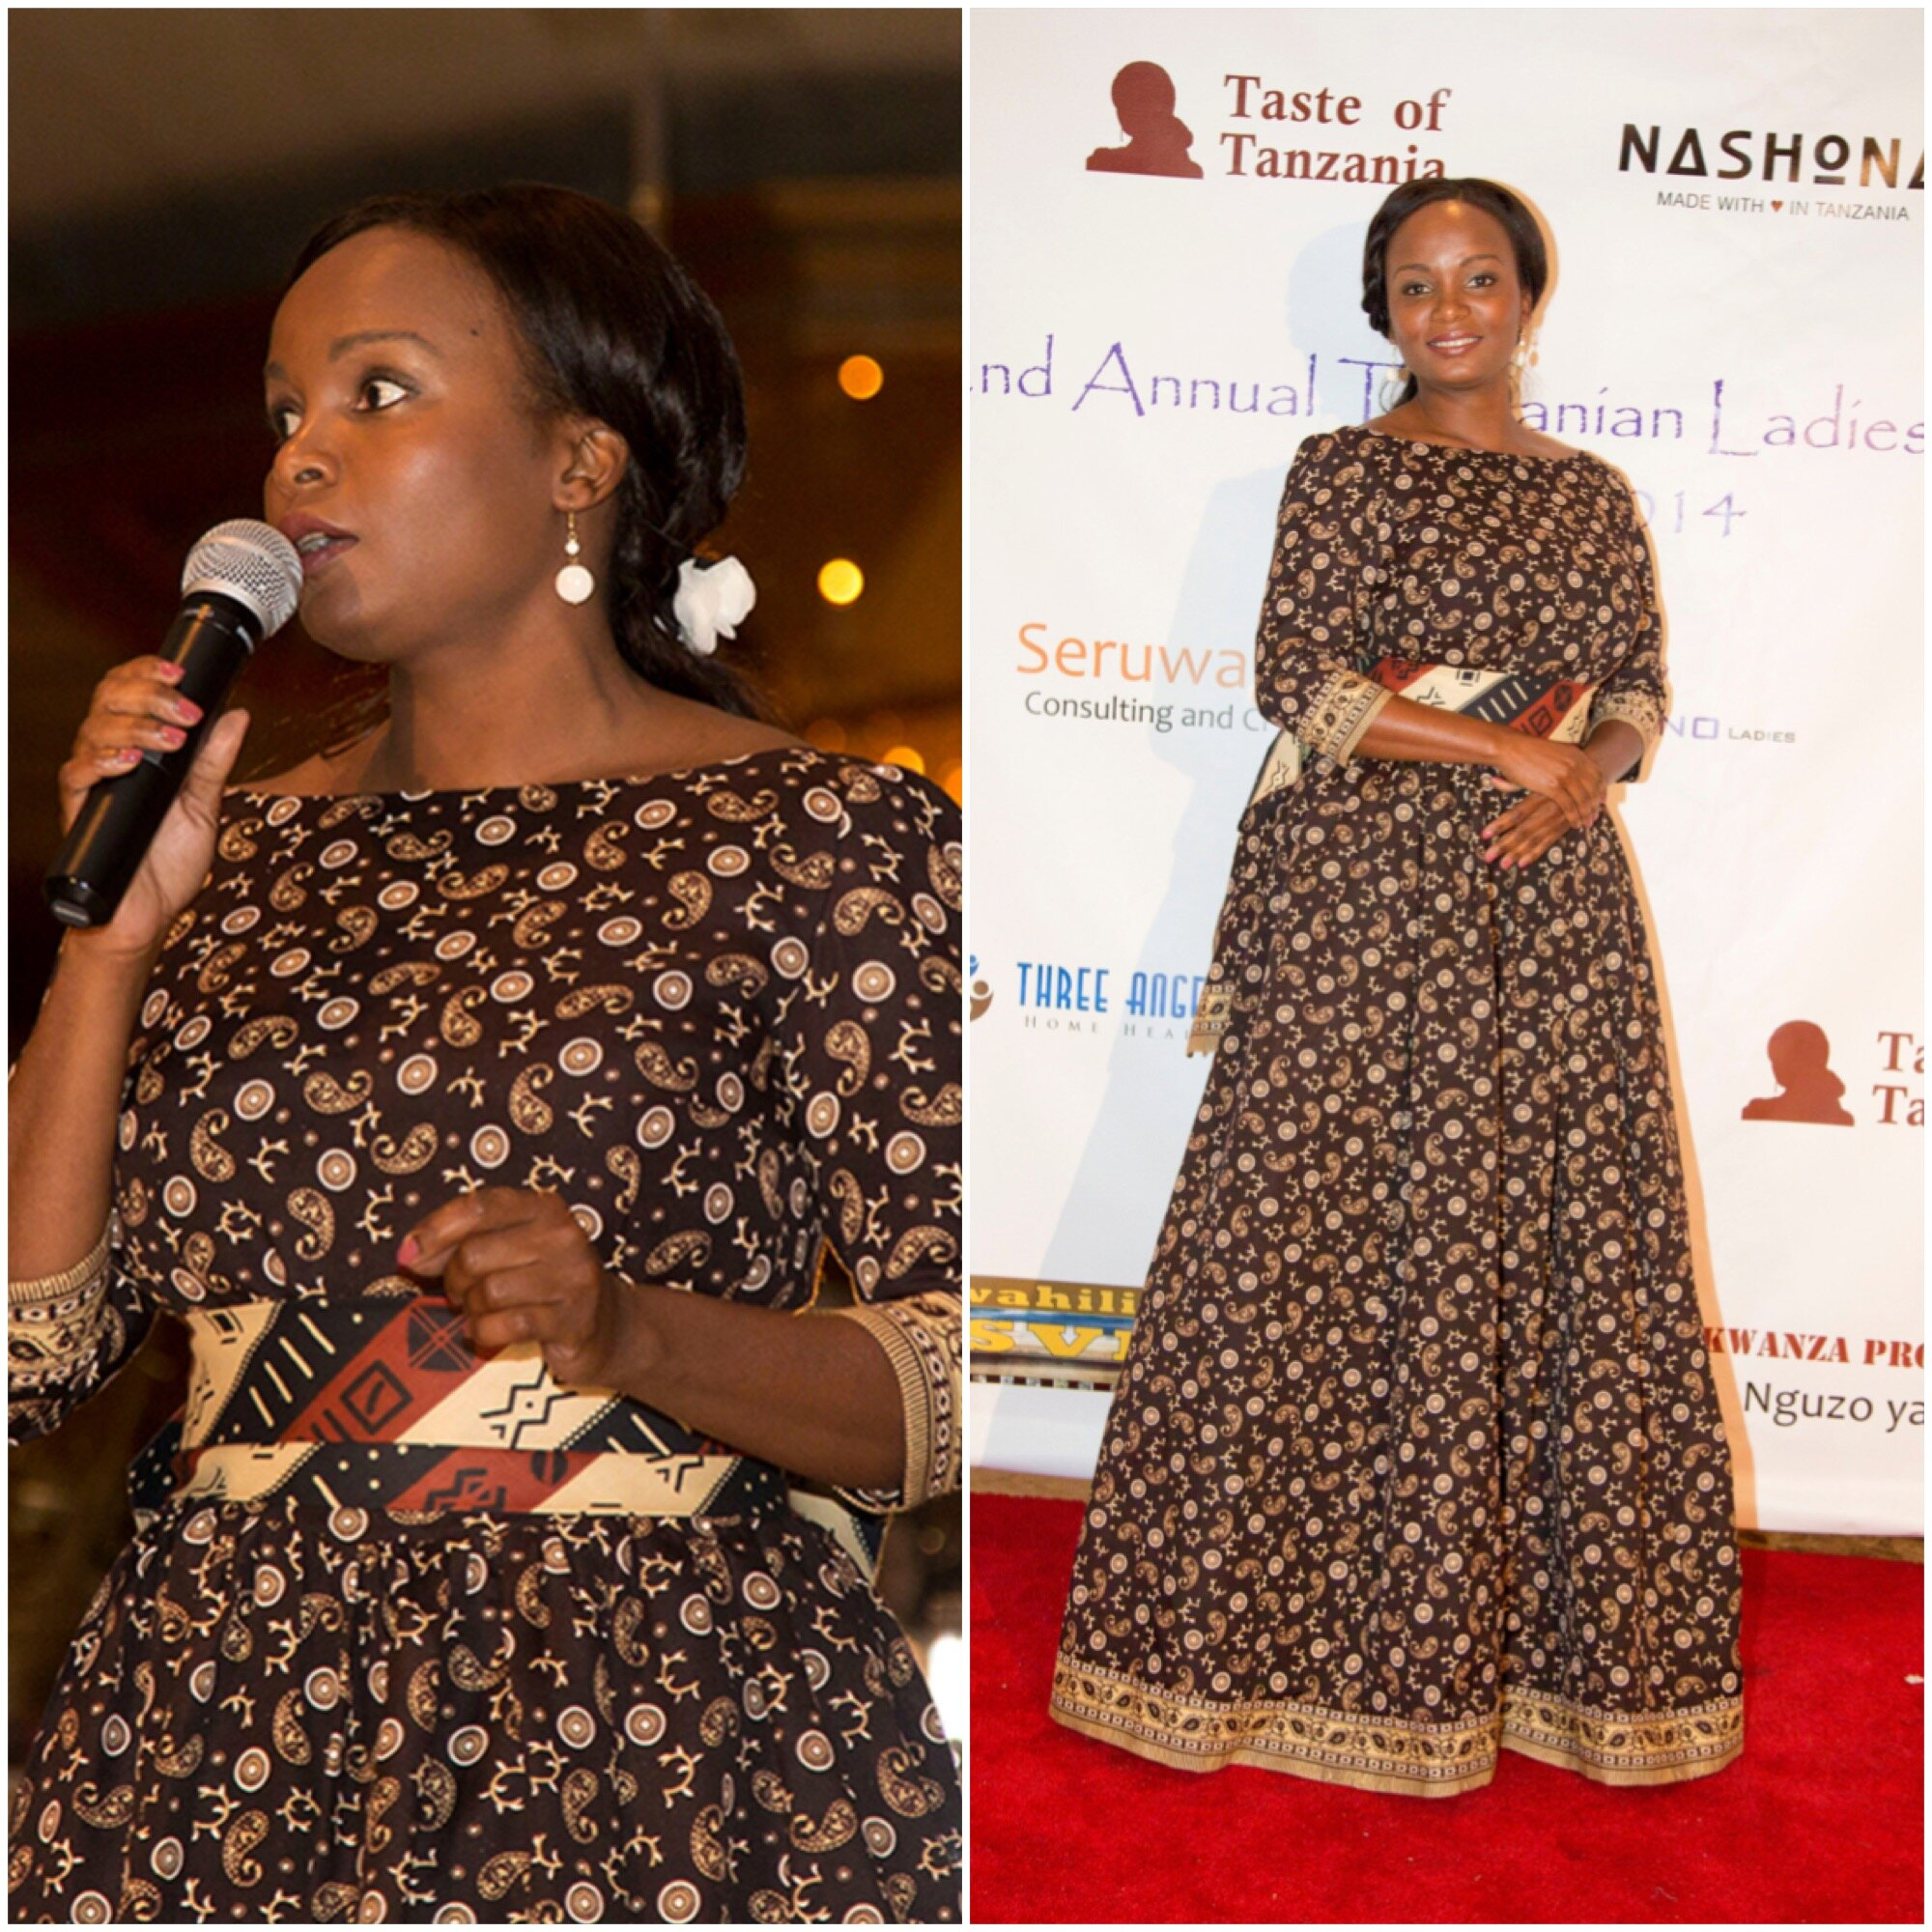 Miriam Kinunda author of Taste of Tanzania wearing one ofa kind African ethnic evening dress designed by Alis Fashion Design at Tanzanian Ladies Night.JPG